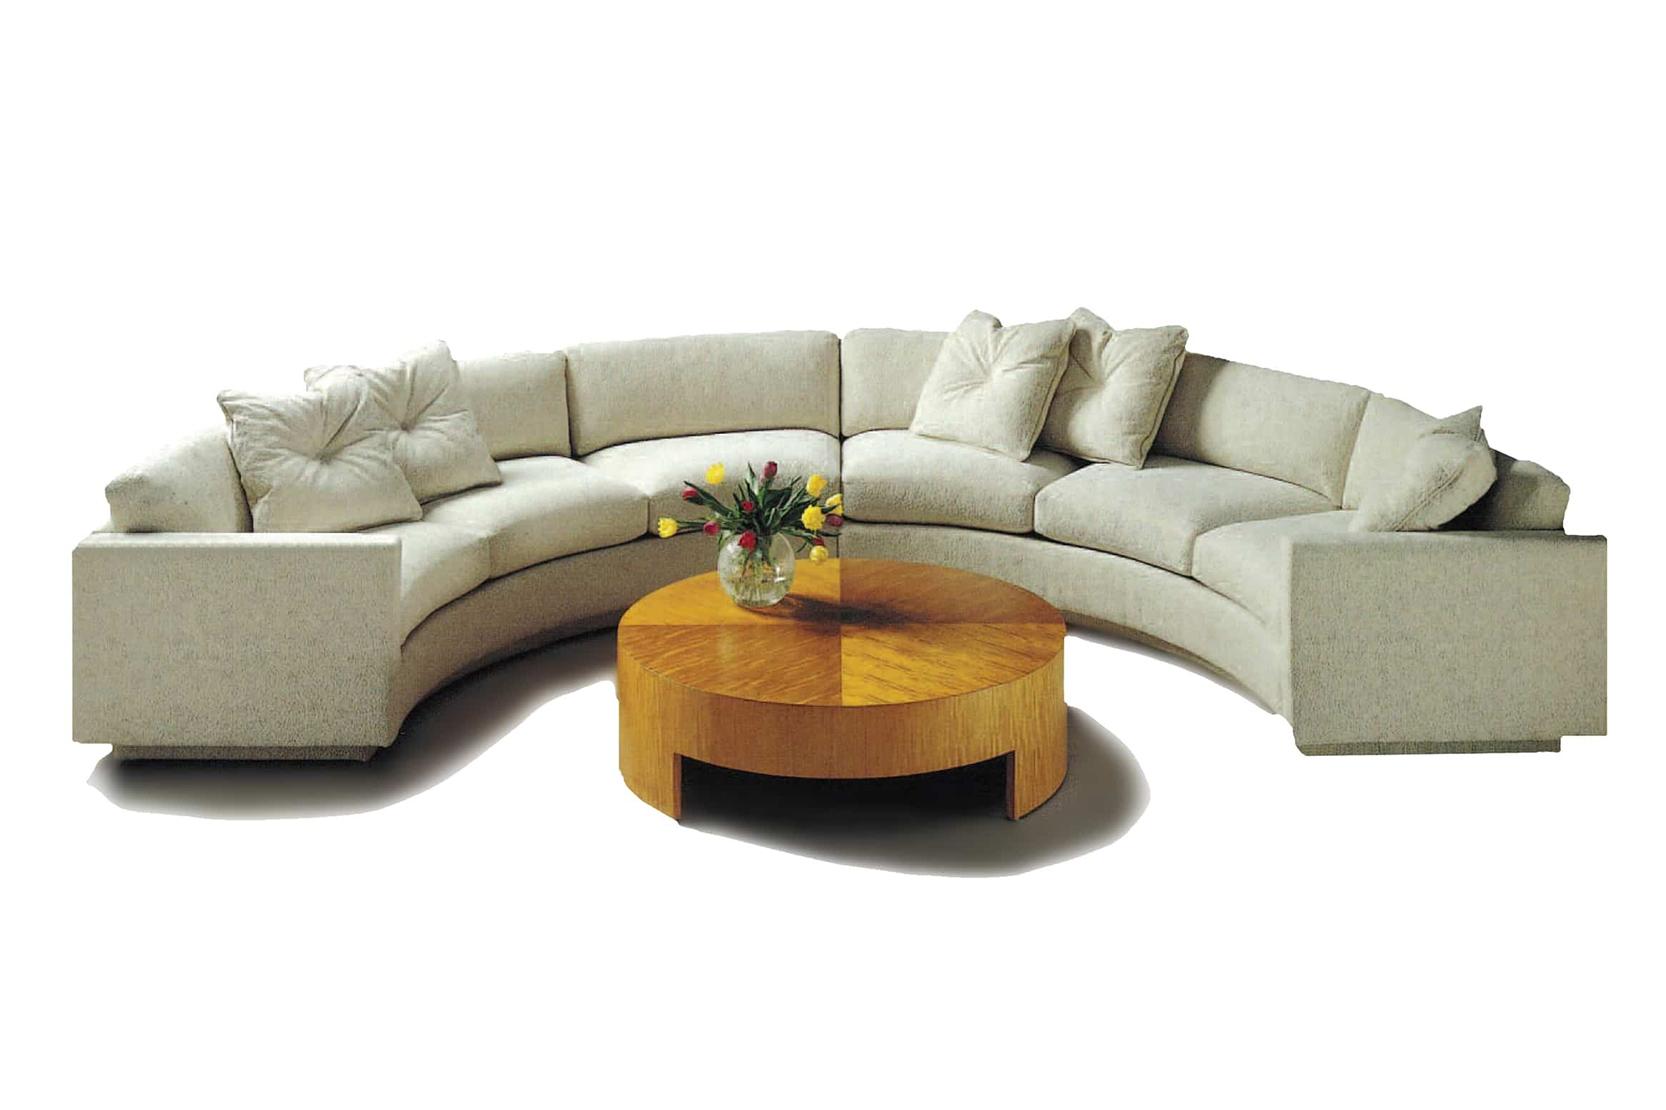 crescent sofa design new york